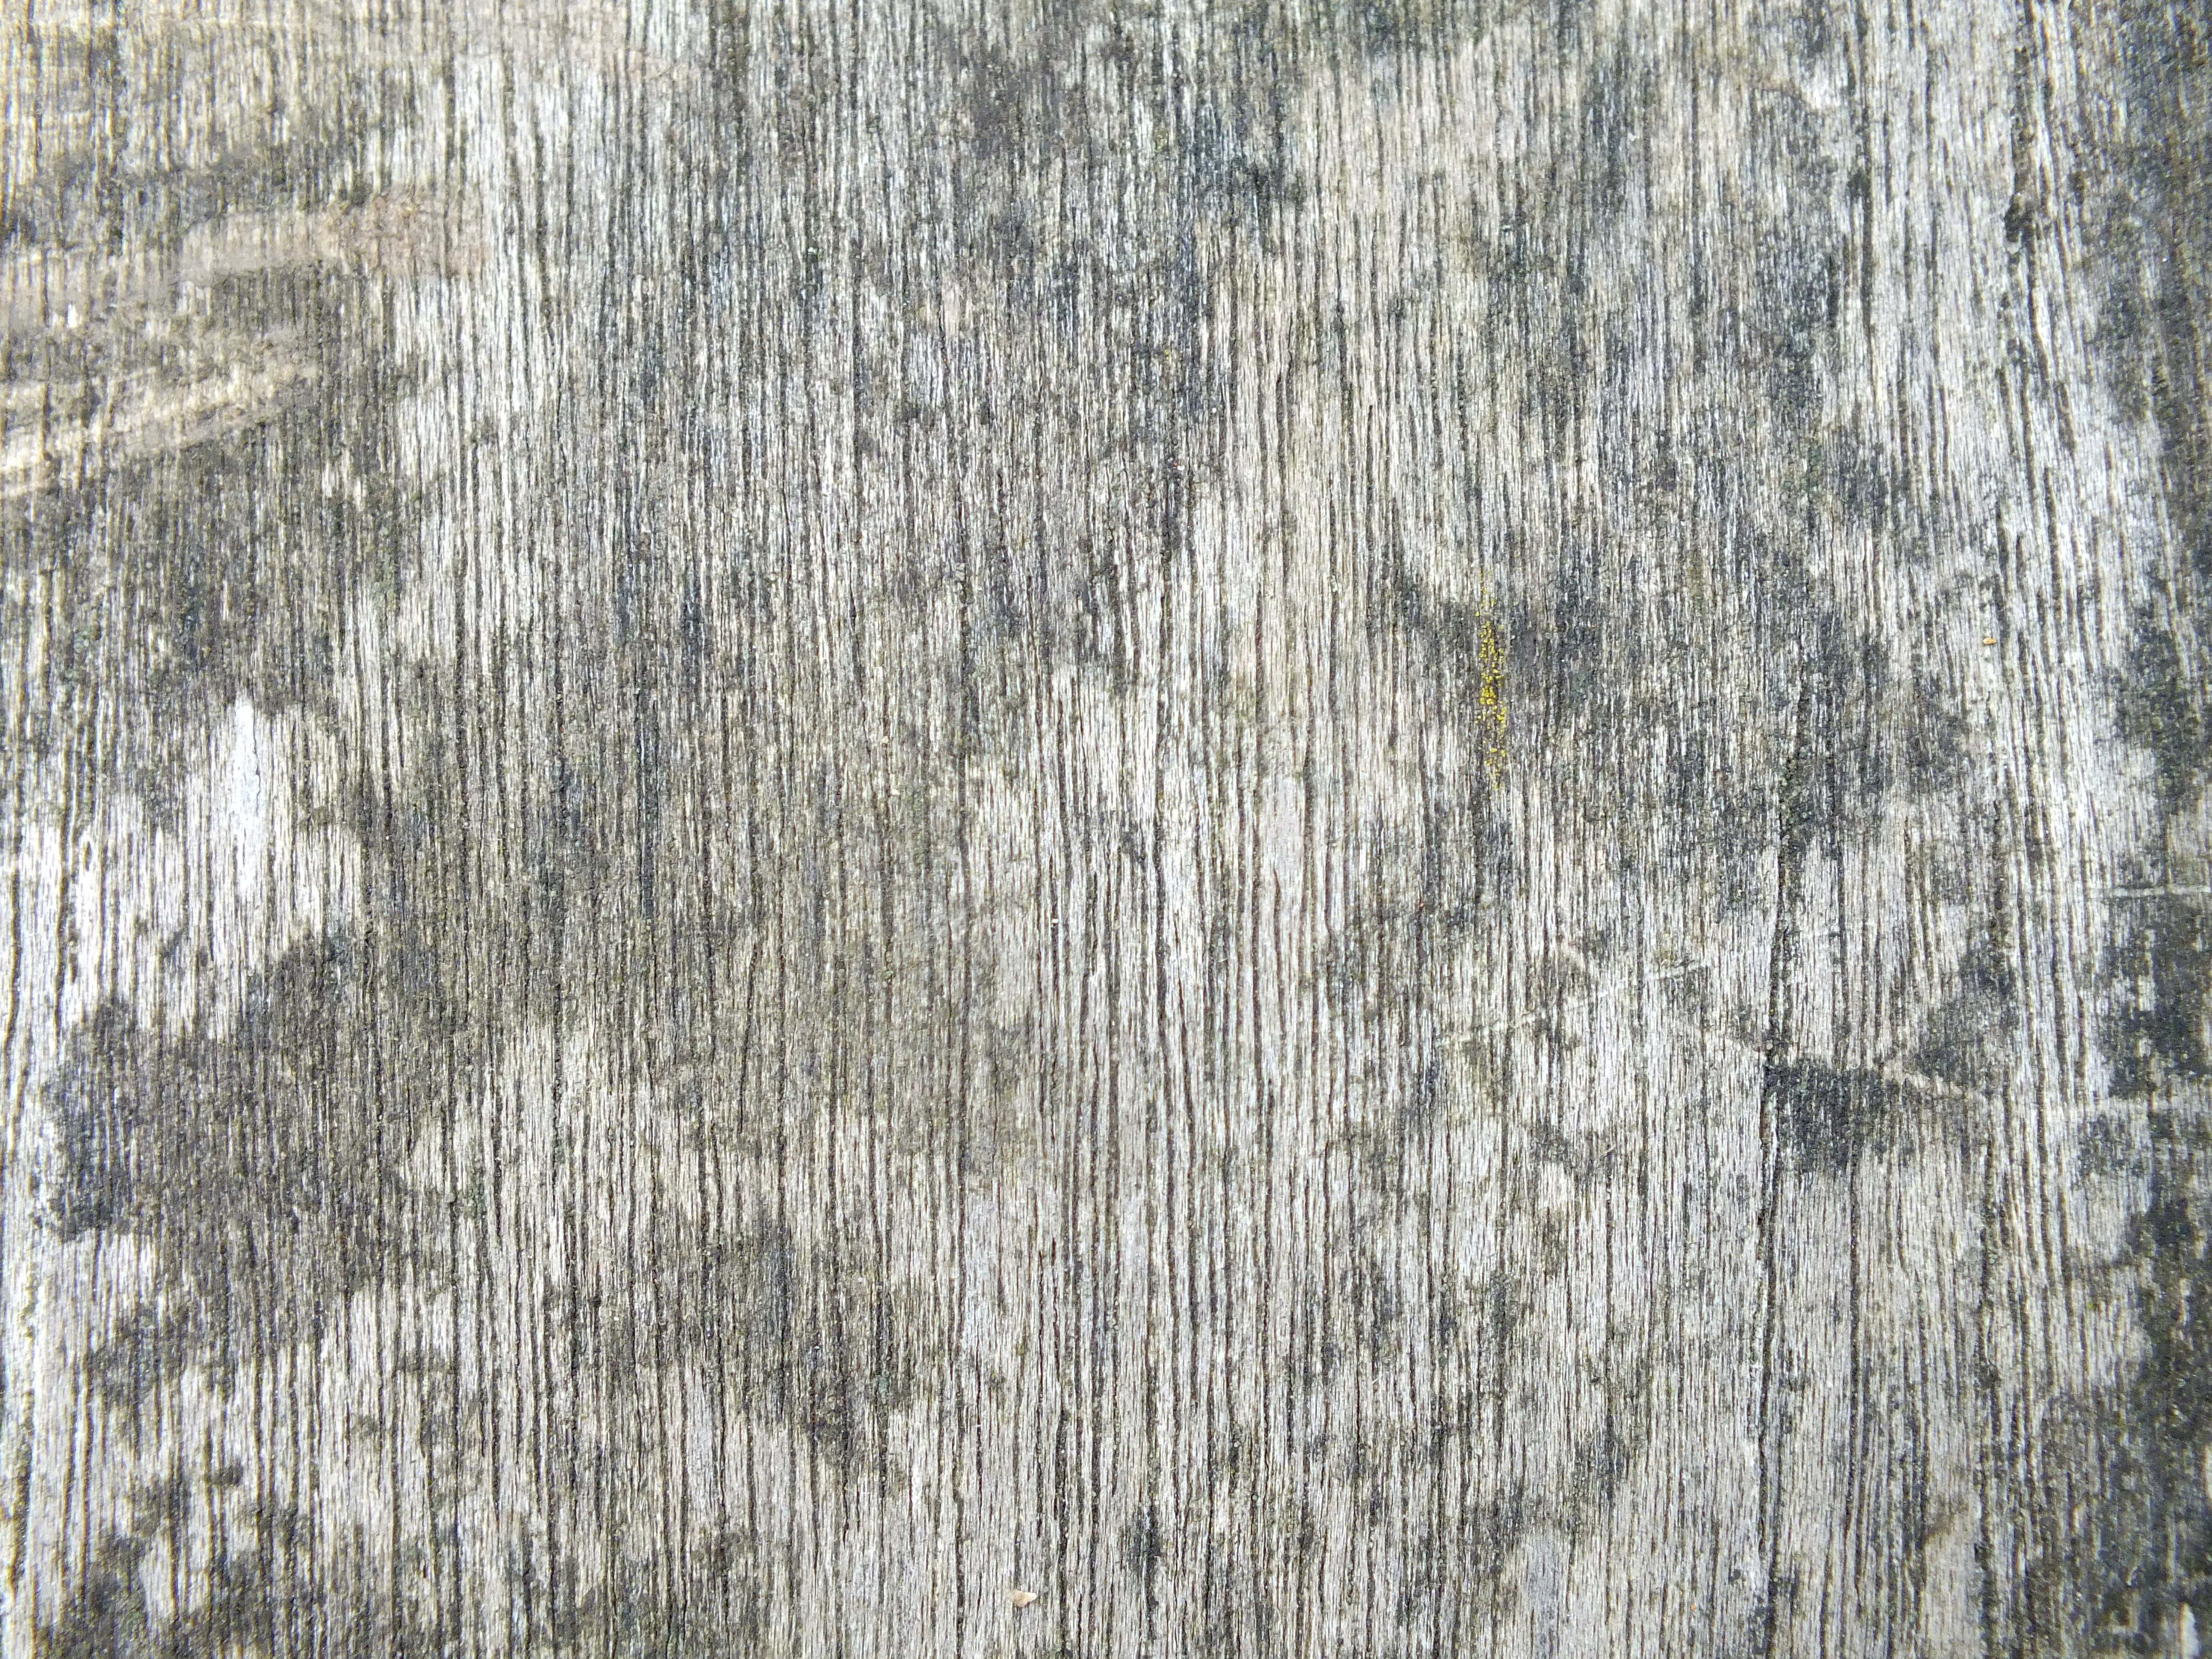 Wood texture, Board, Texture, Tree, Wood, HQ Photo